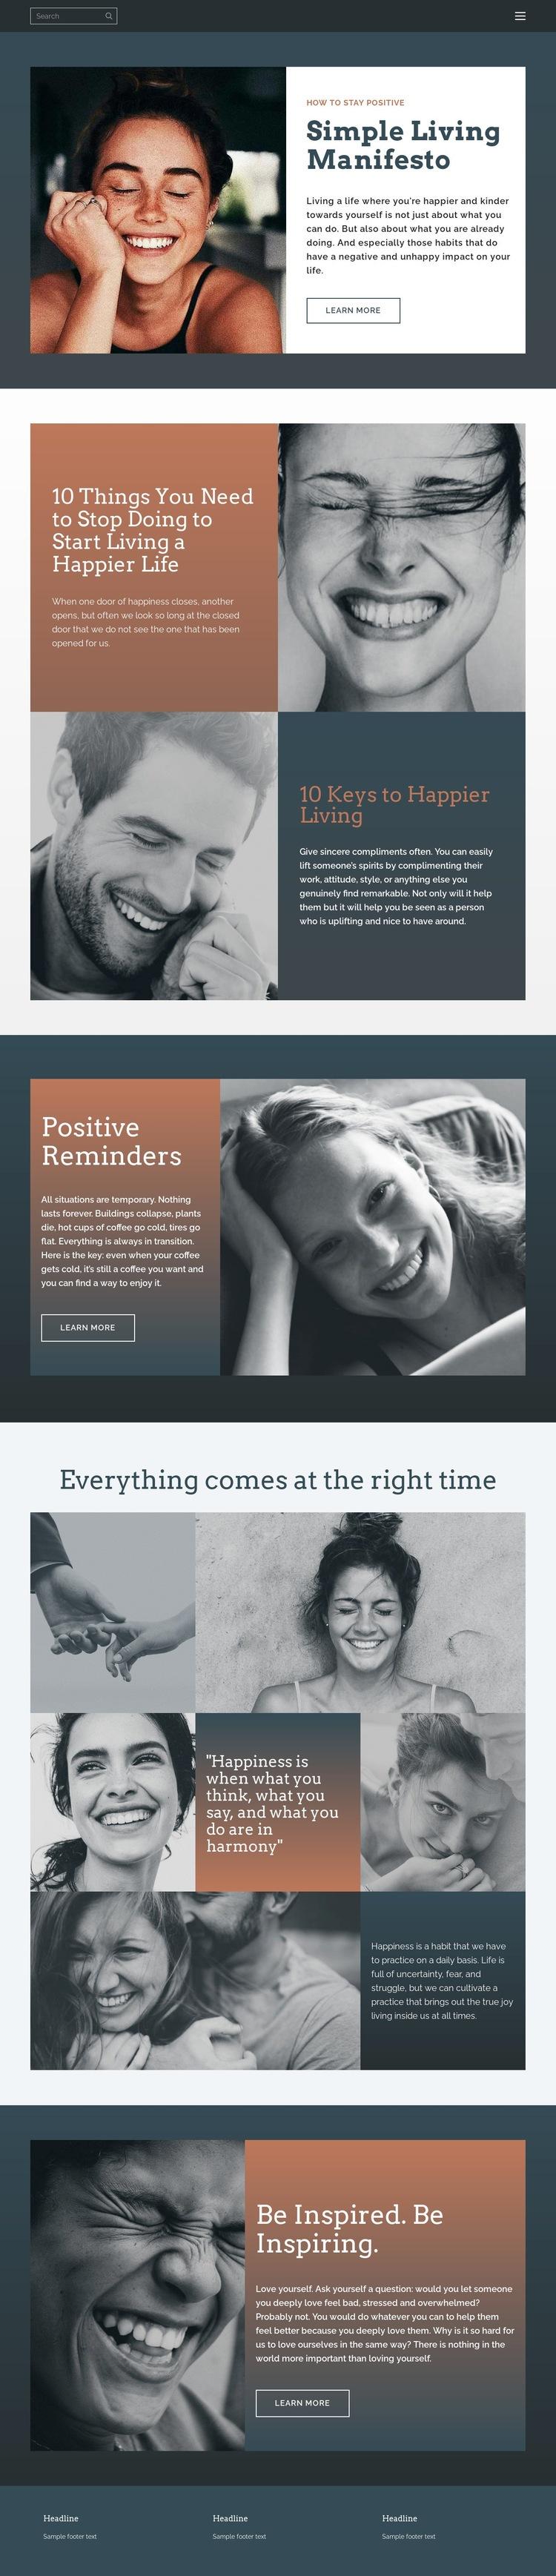 Simple living manifesto Html Code Example